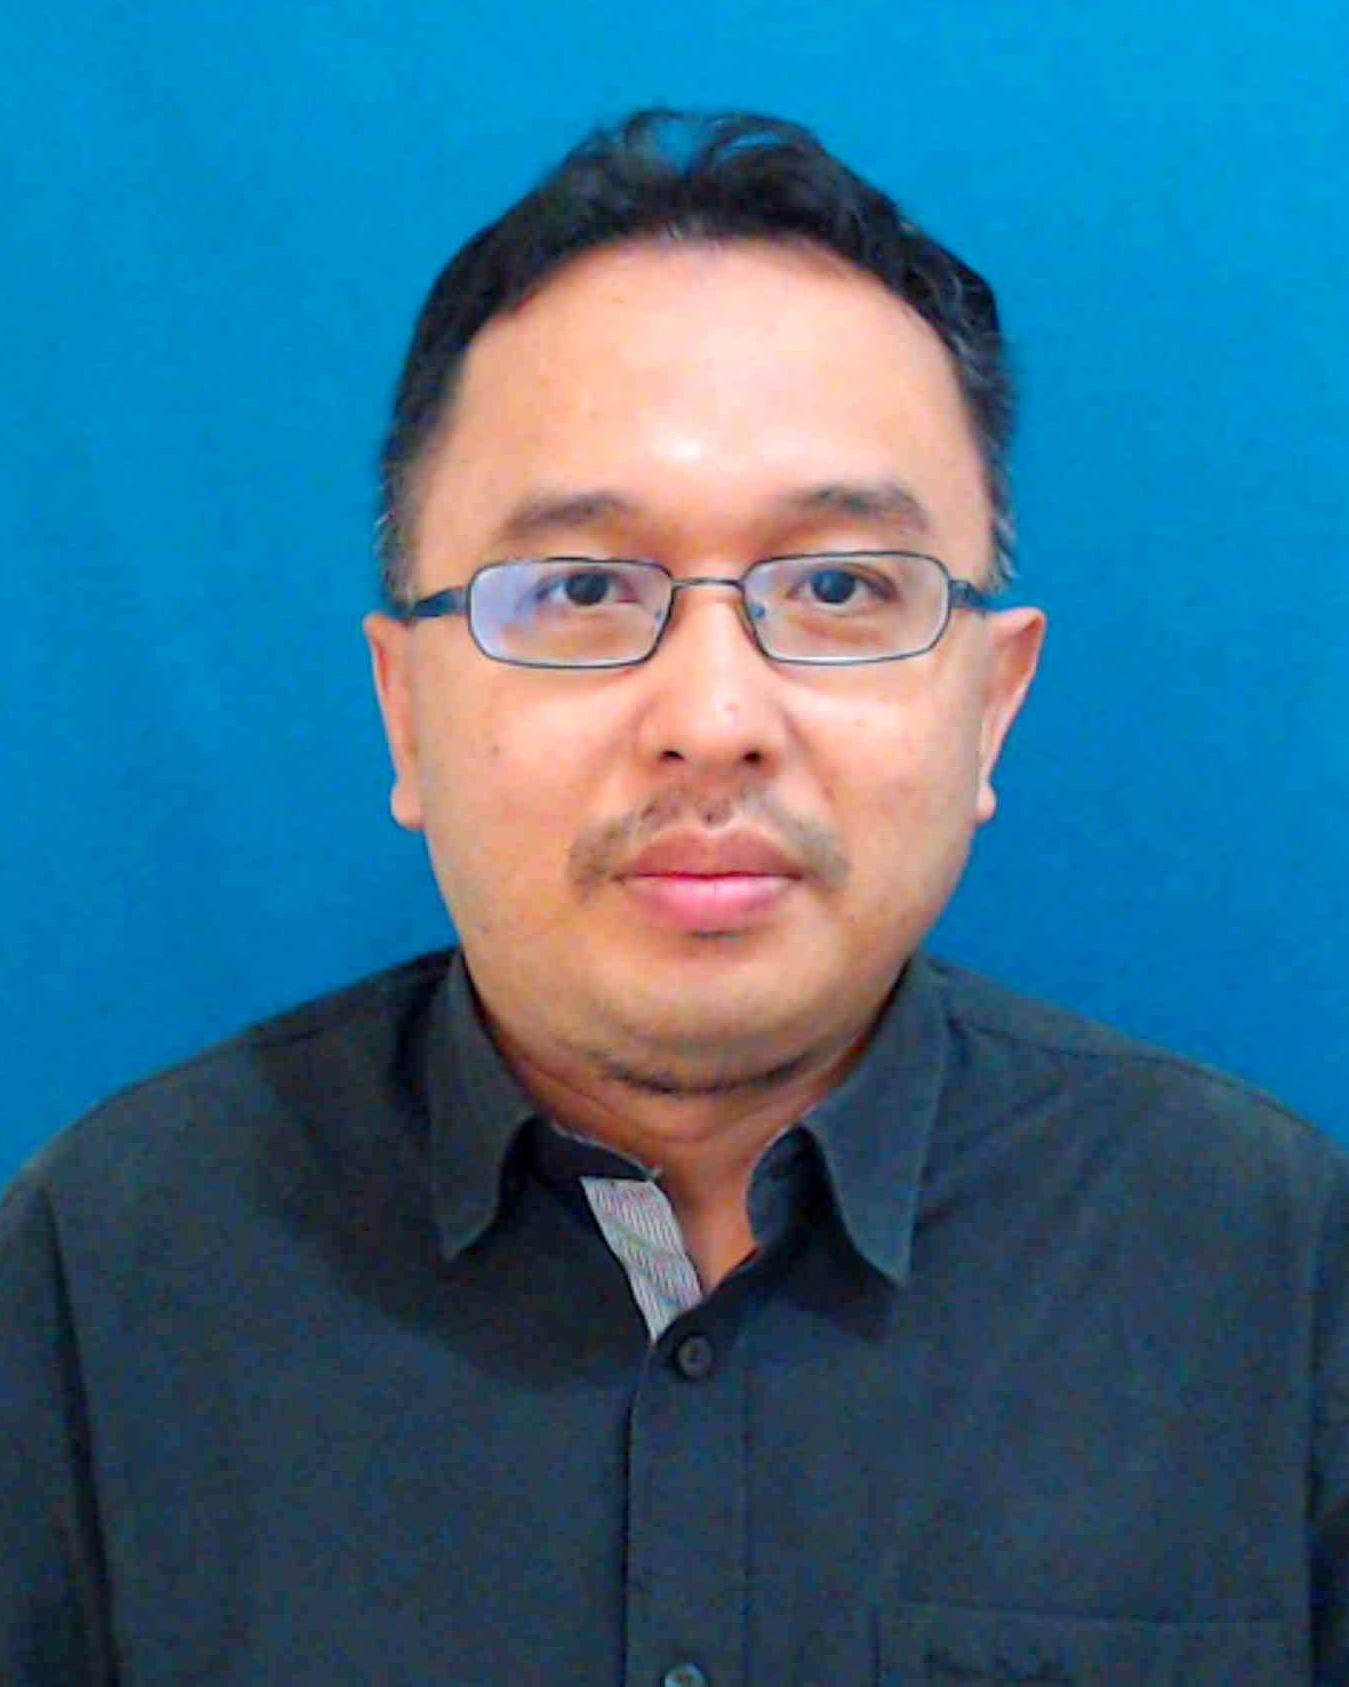 Mohammad Syaiful Bahari Bin Abdull Rasad